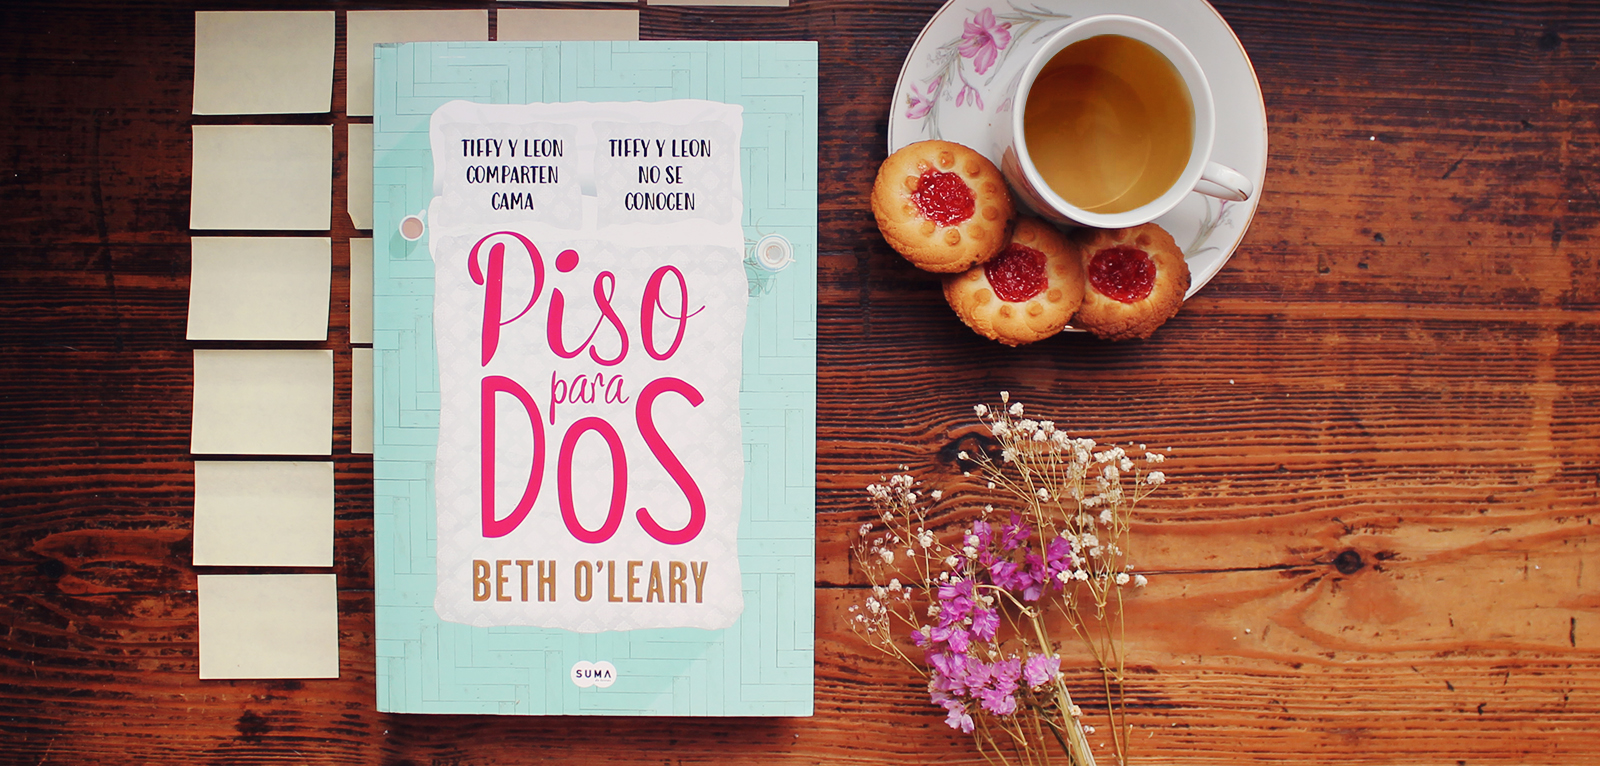 Piso para dos · Beth O'Leary